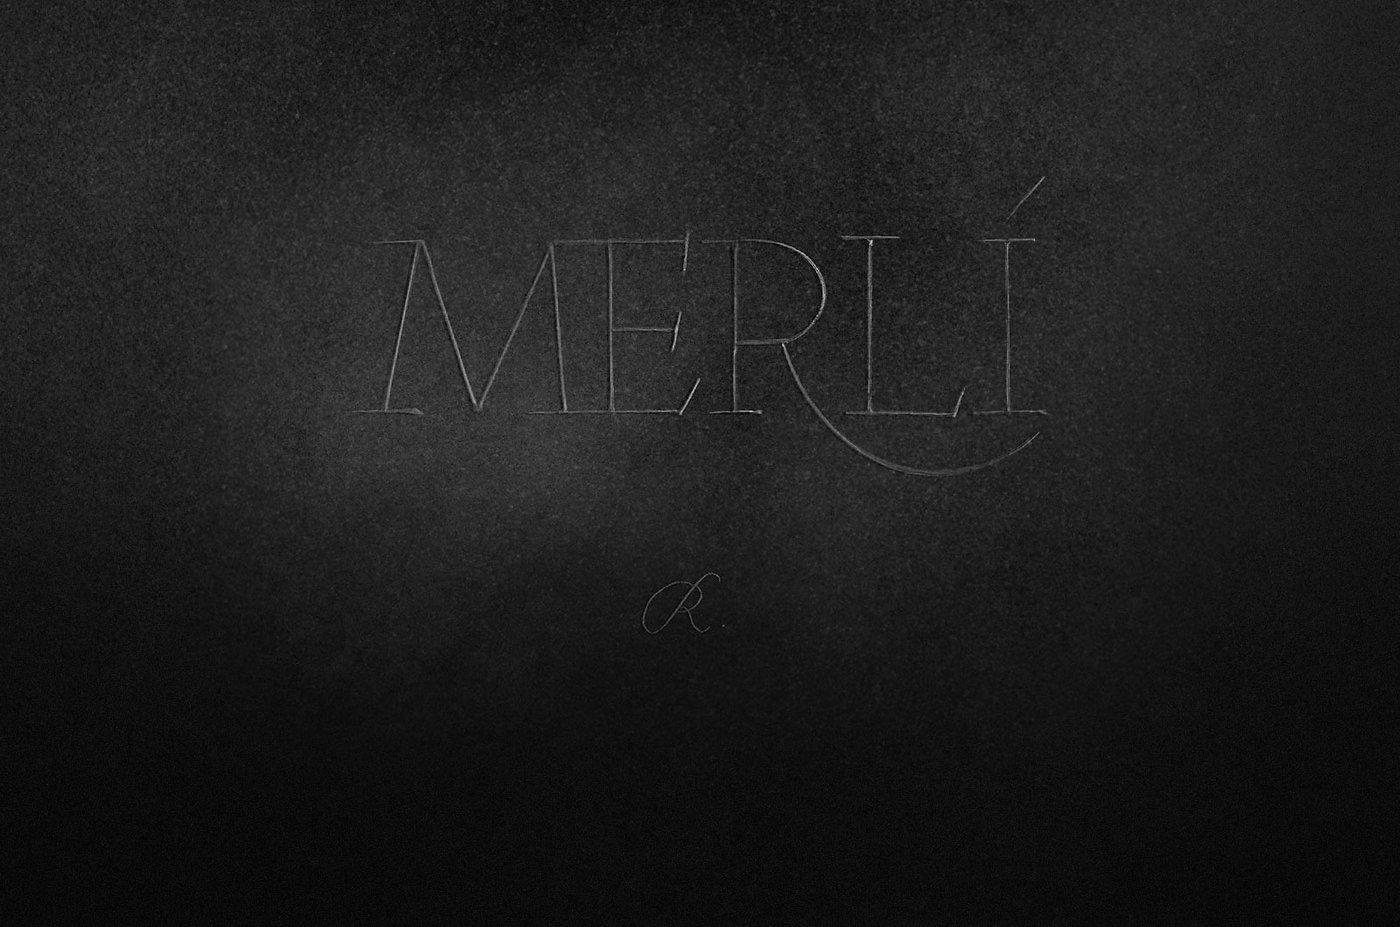 VHS-Merlí-behance_04.jpg